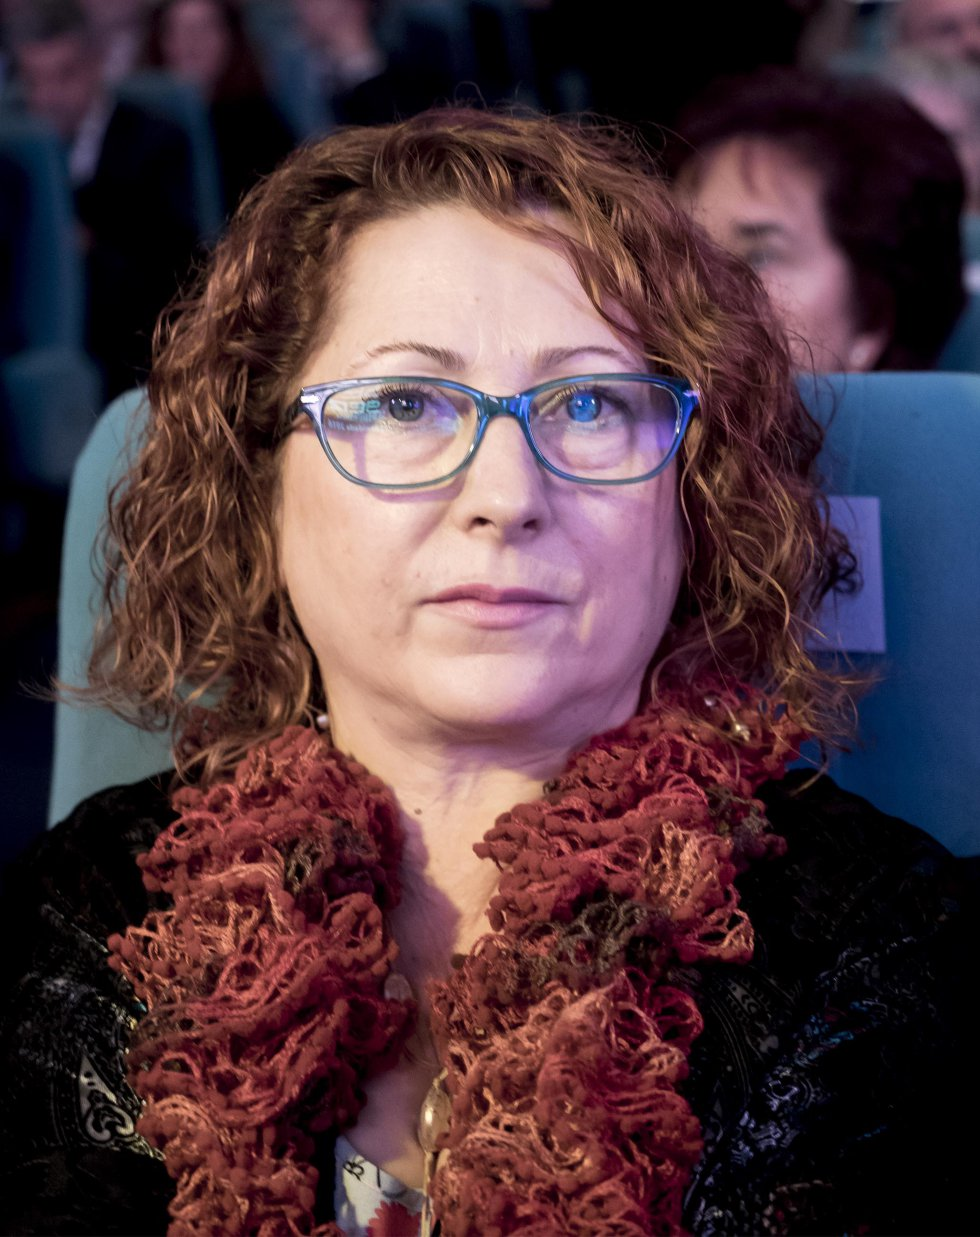 La madre de Vero Boquete, Mercedes Giadans